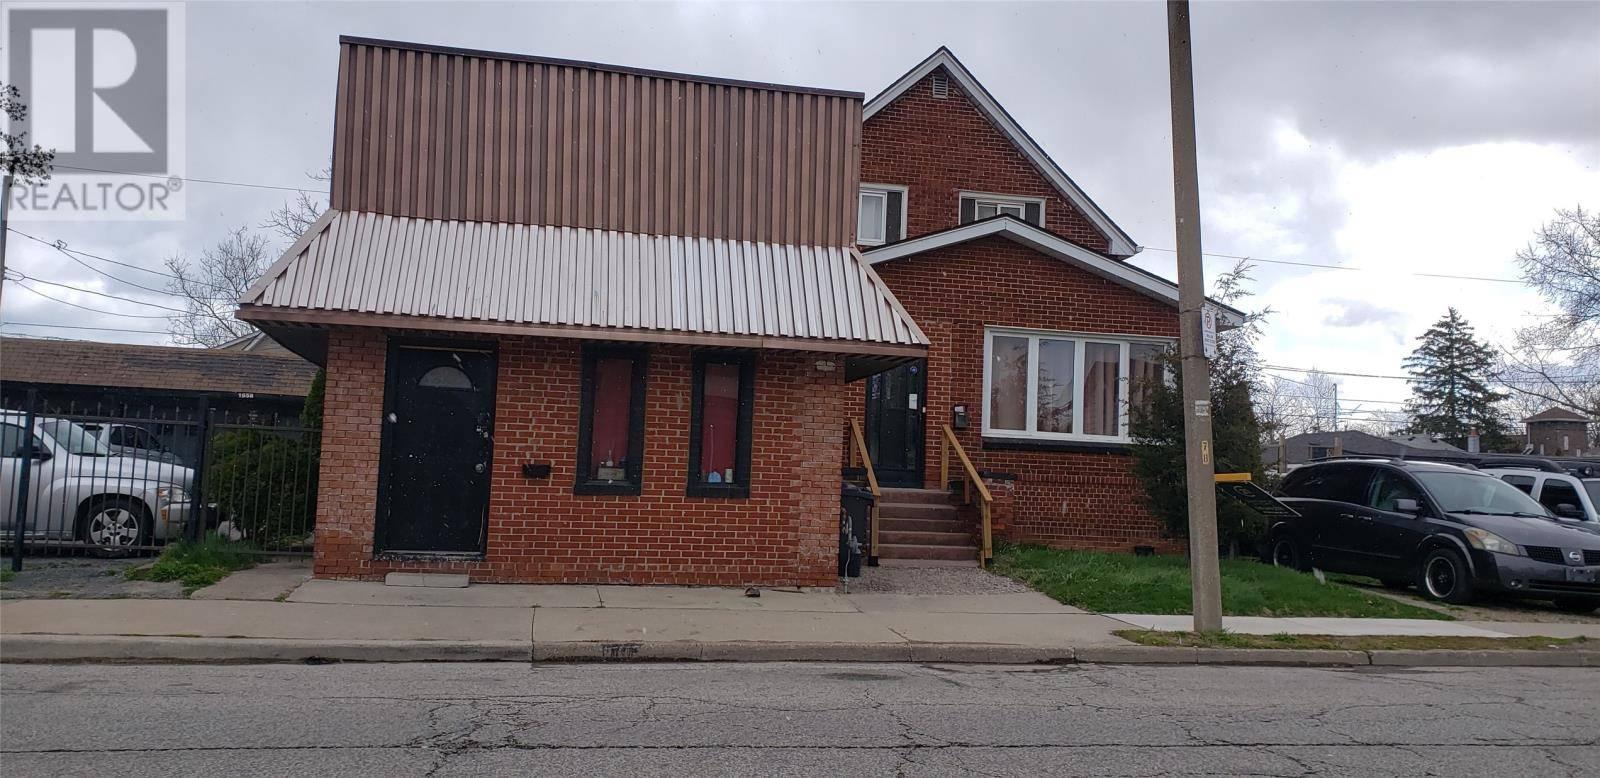 Townhouse for sale at 1658 Drouillard  Windsor Ontario - MLS: 20004465